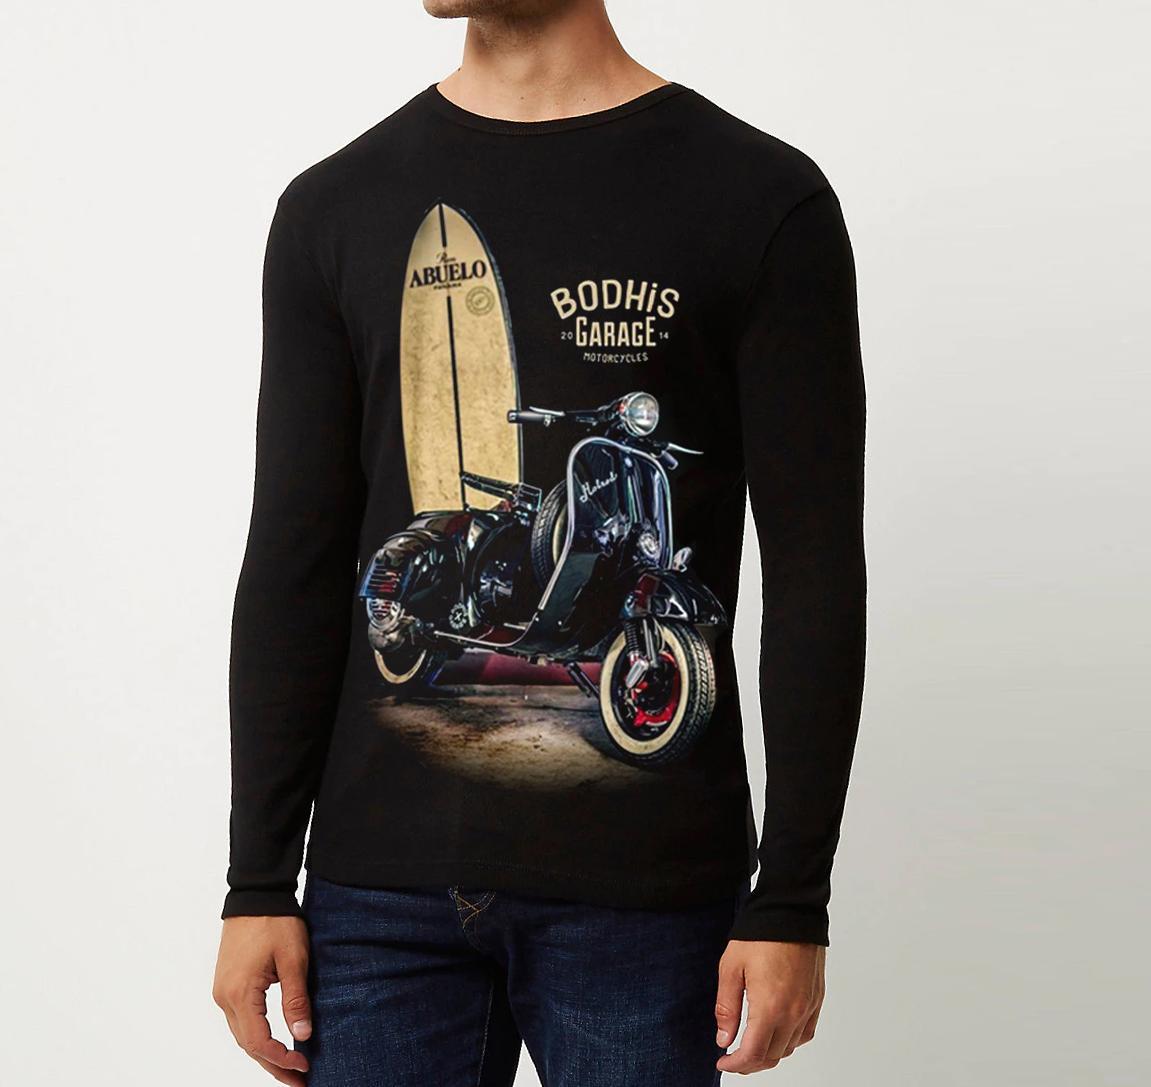 Berton Store Kaos Pria Lengan Panjang Vespa Hitam / Kaos T-Shirt Distro Pria / Kaos Pria Keren / Baju Pria Tangan Panjang / Kaos Pria Terbaru / Kaos Distro Pria Bandung